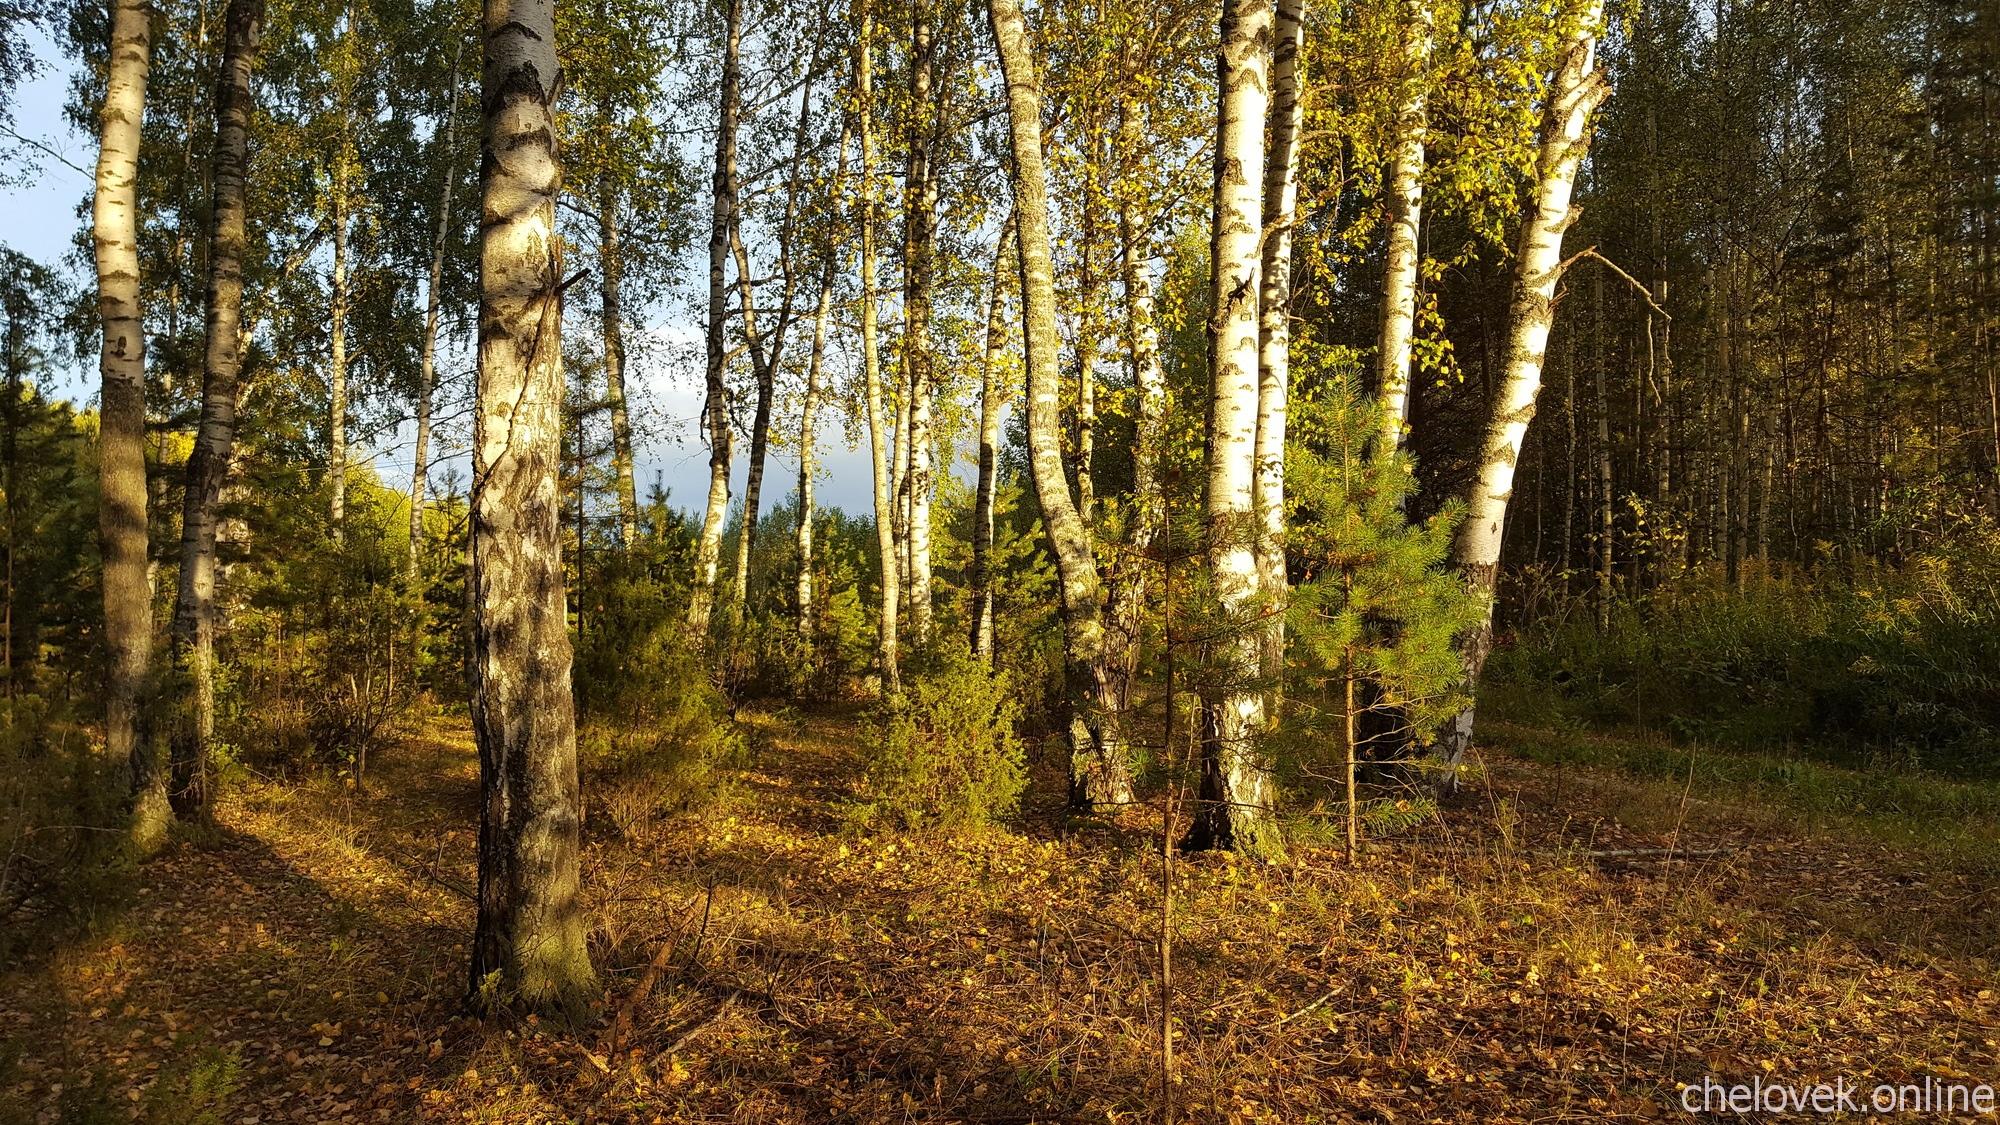 Золотая осень, на закате дня. Сентябрь 2019 года